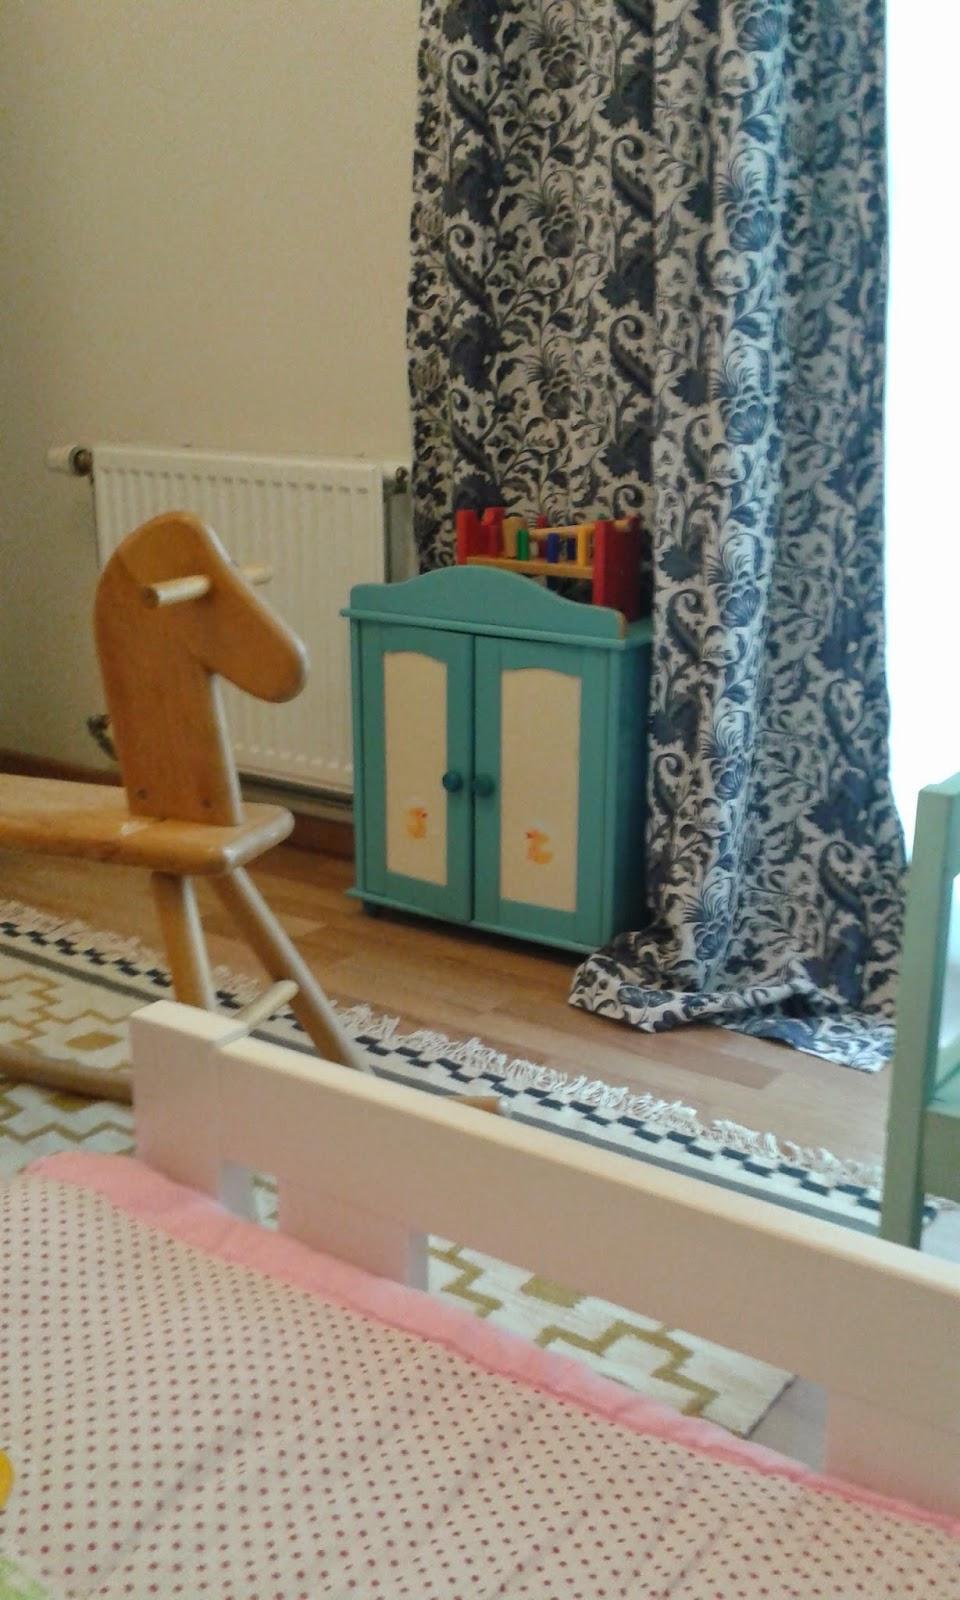 Semaine montessori : (2) la chambre de bambou inspirée (ou pas) de ...